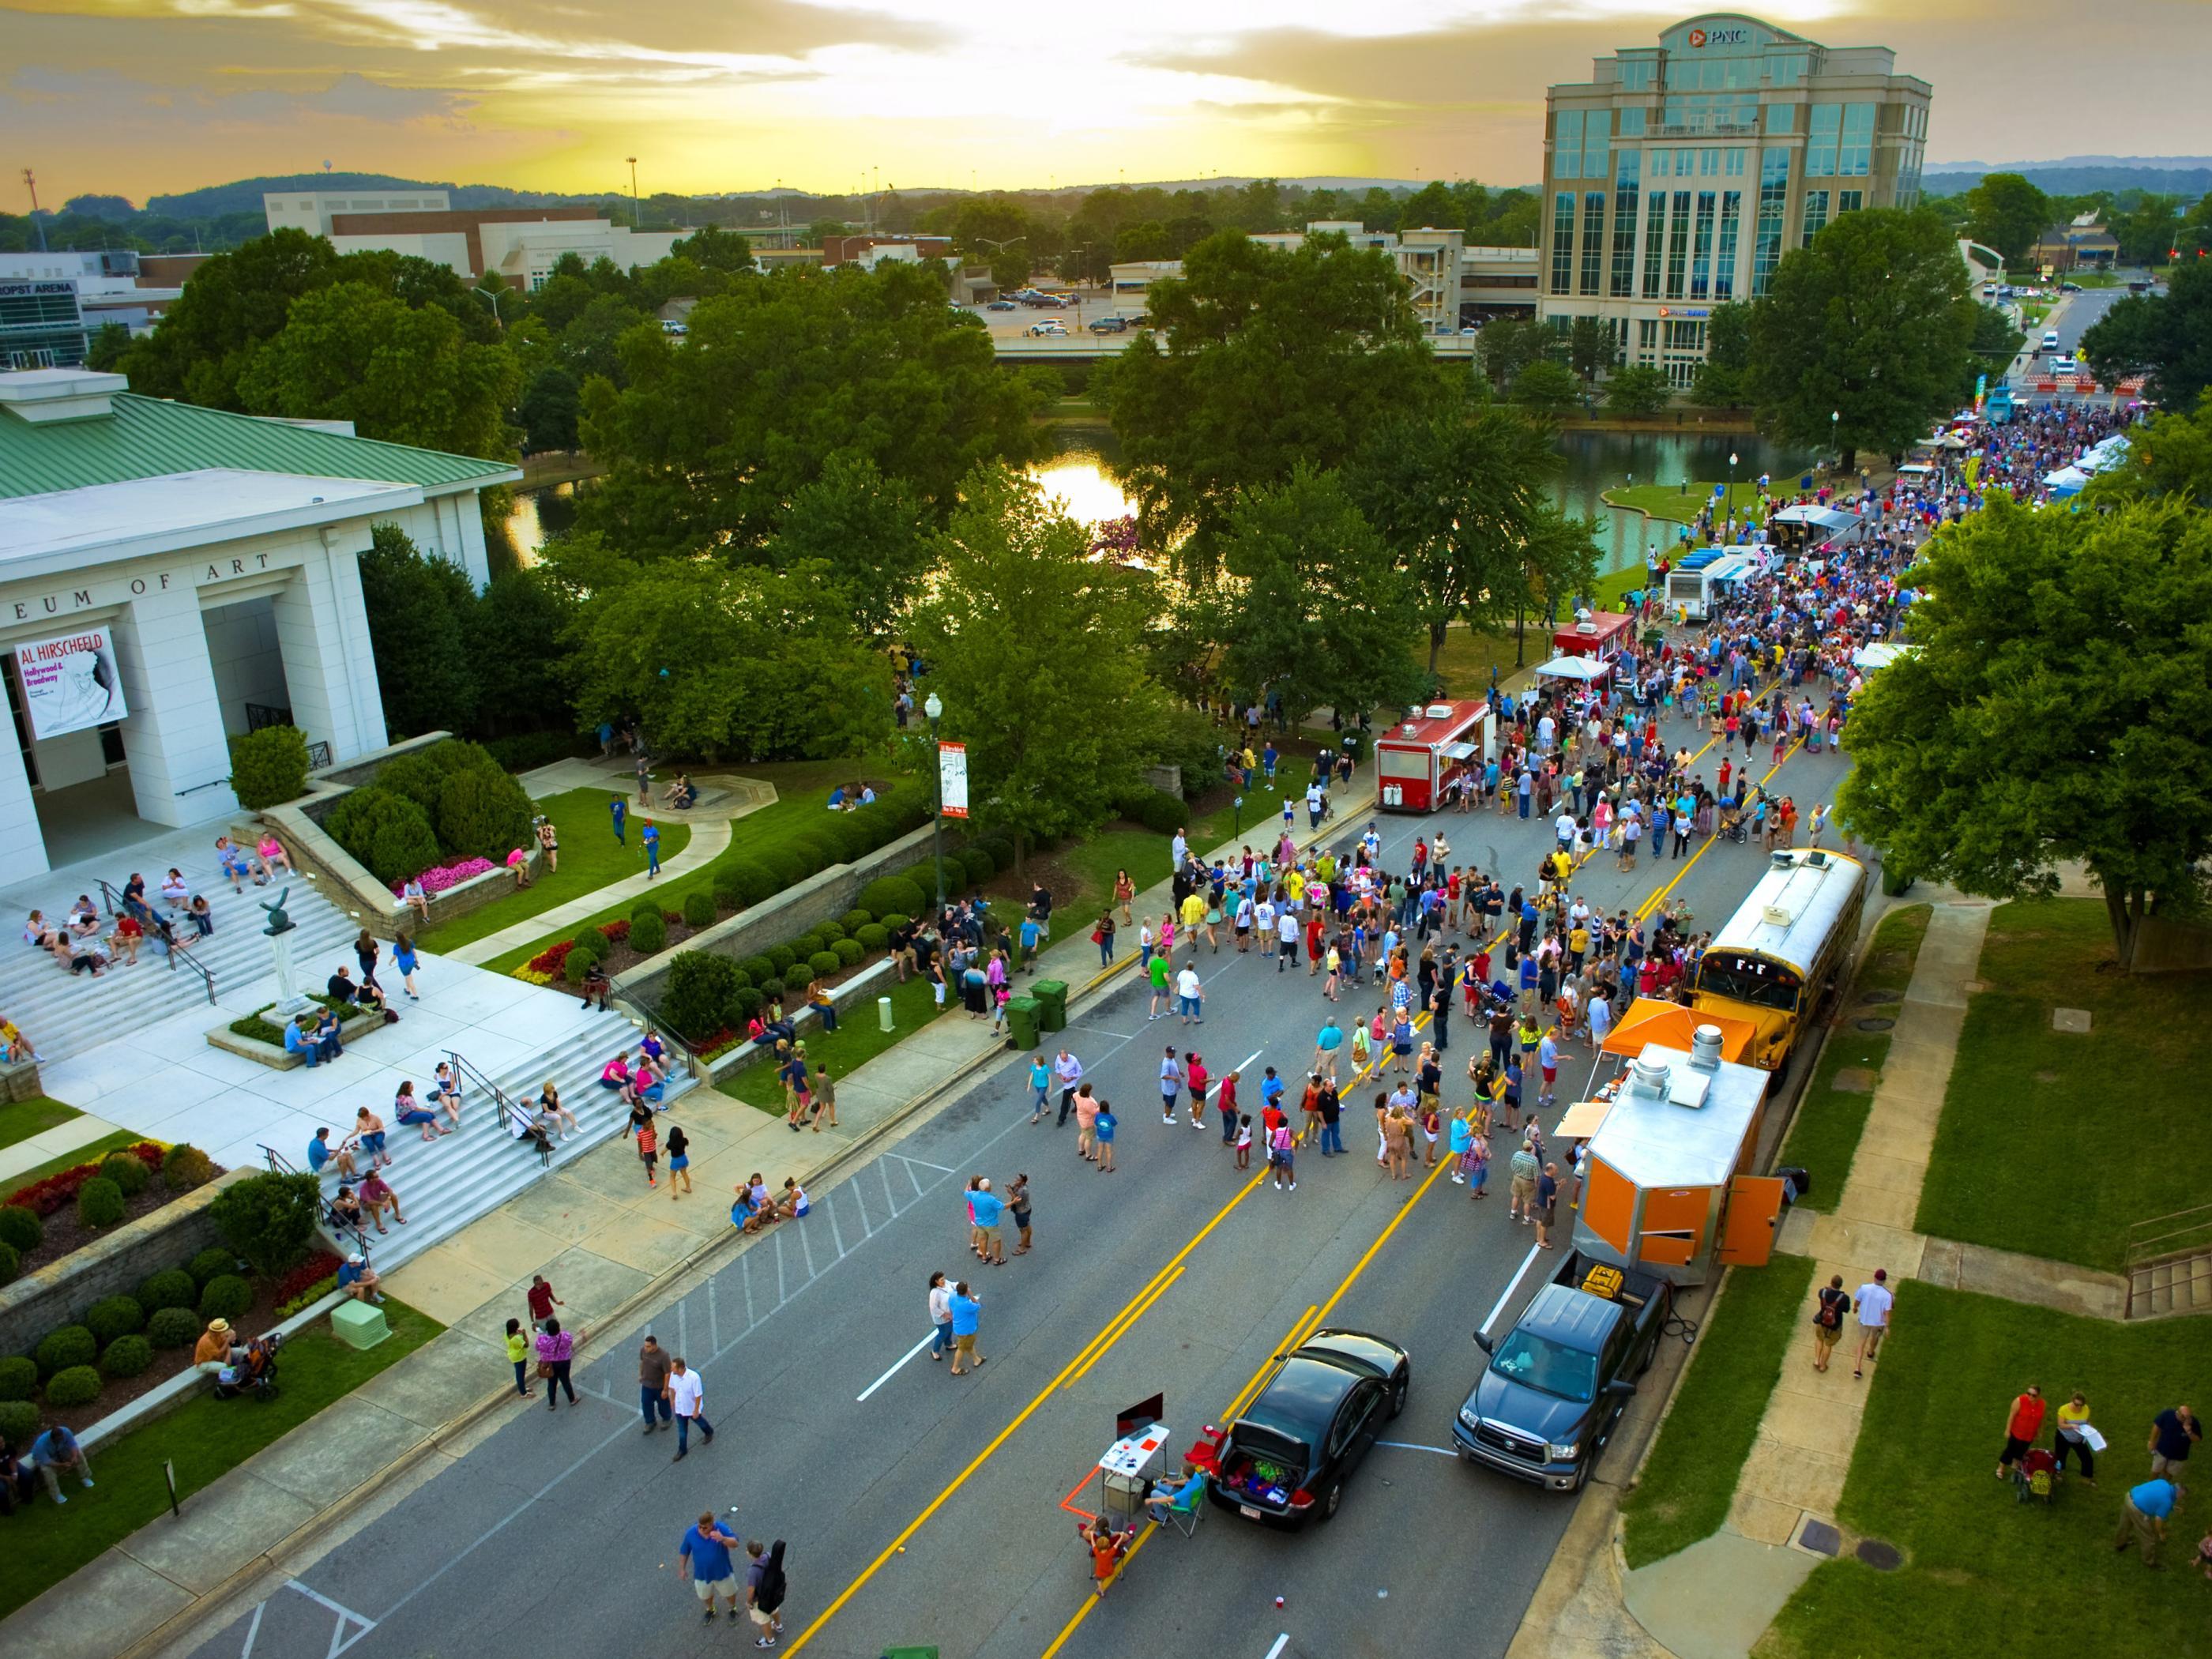 Huntsville, Alabama - Travel and Tourism Information